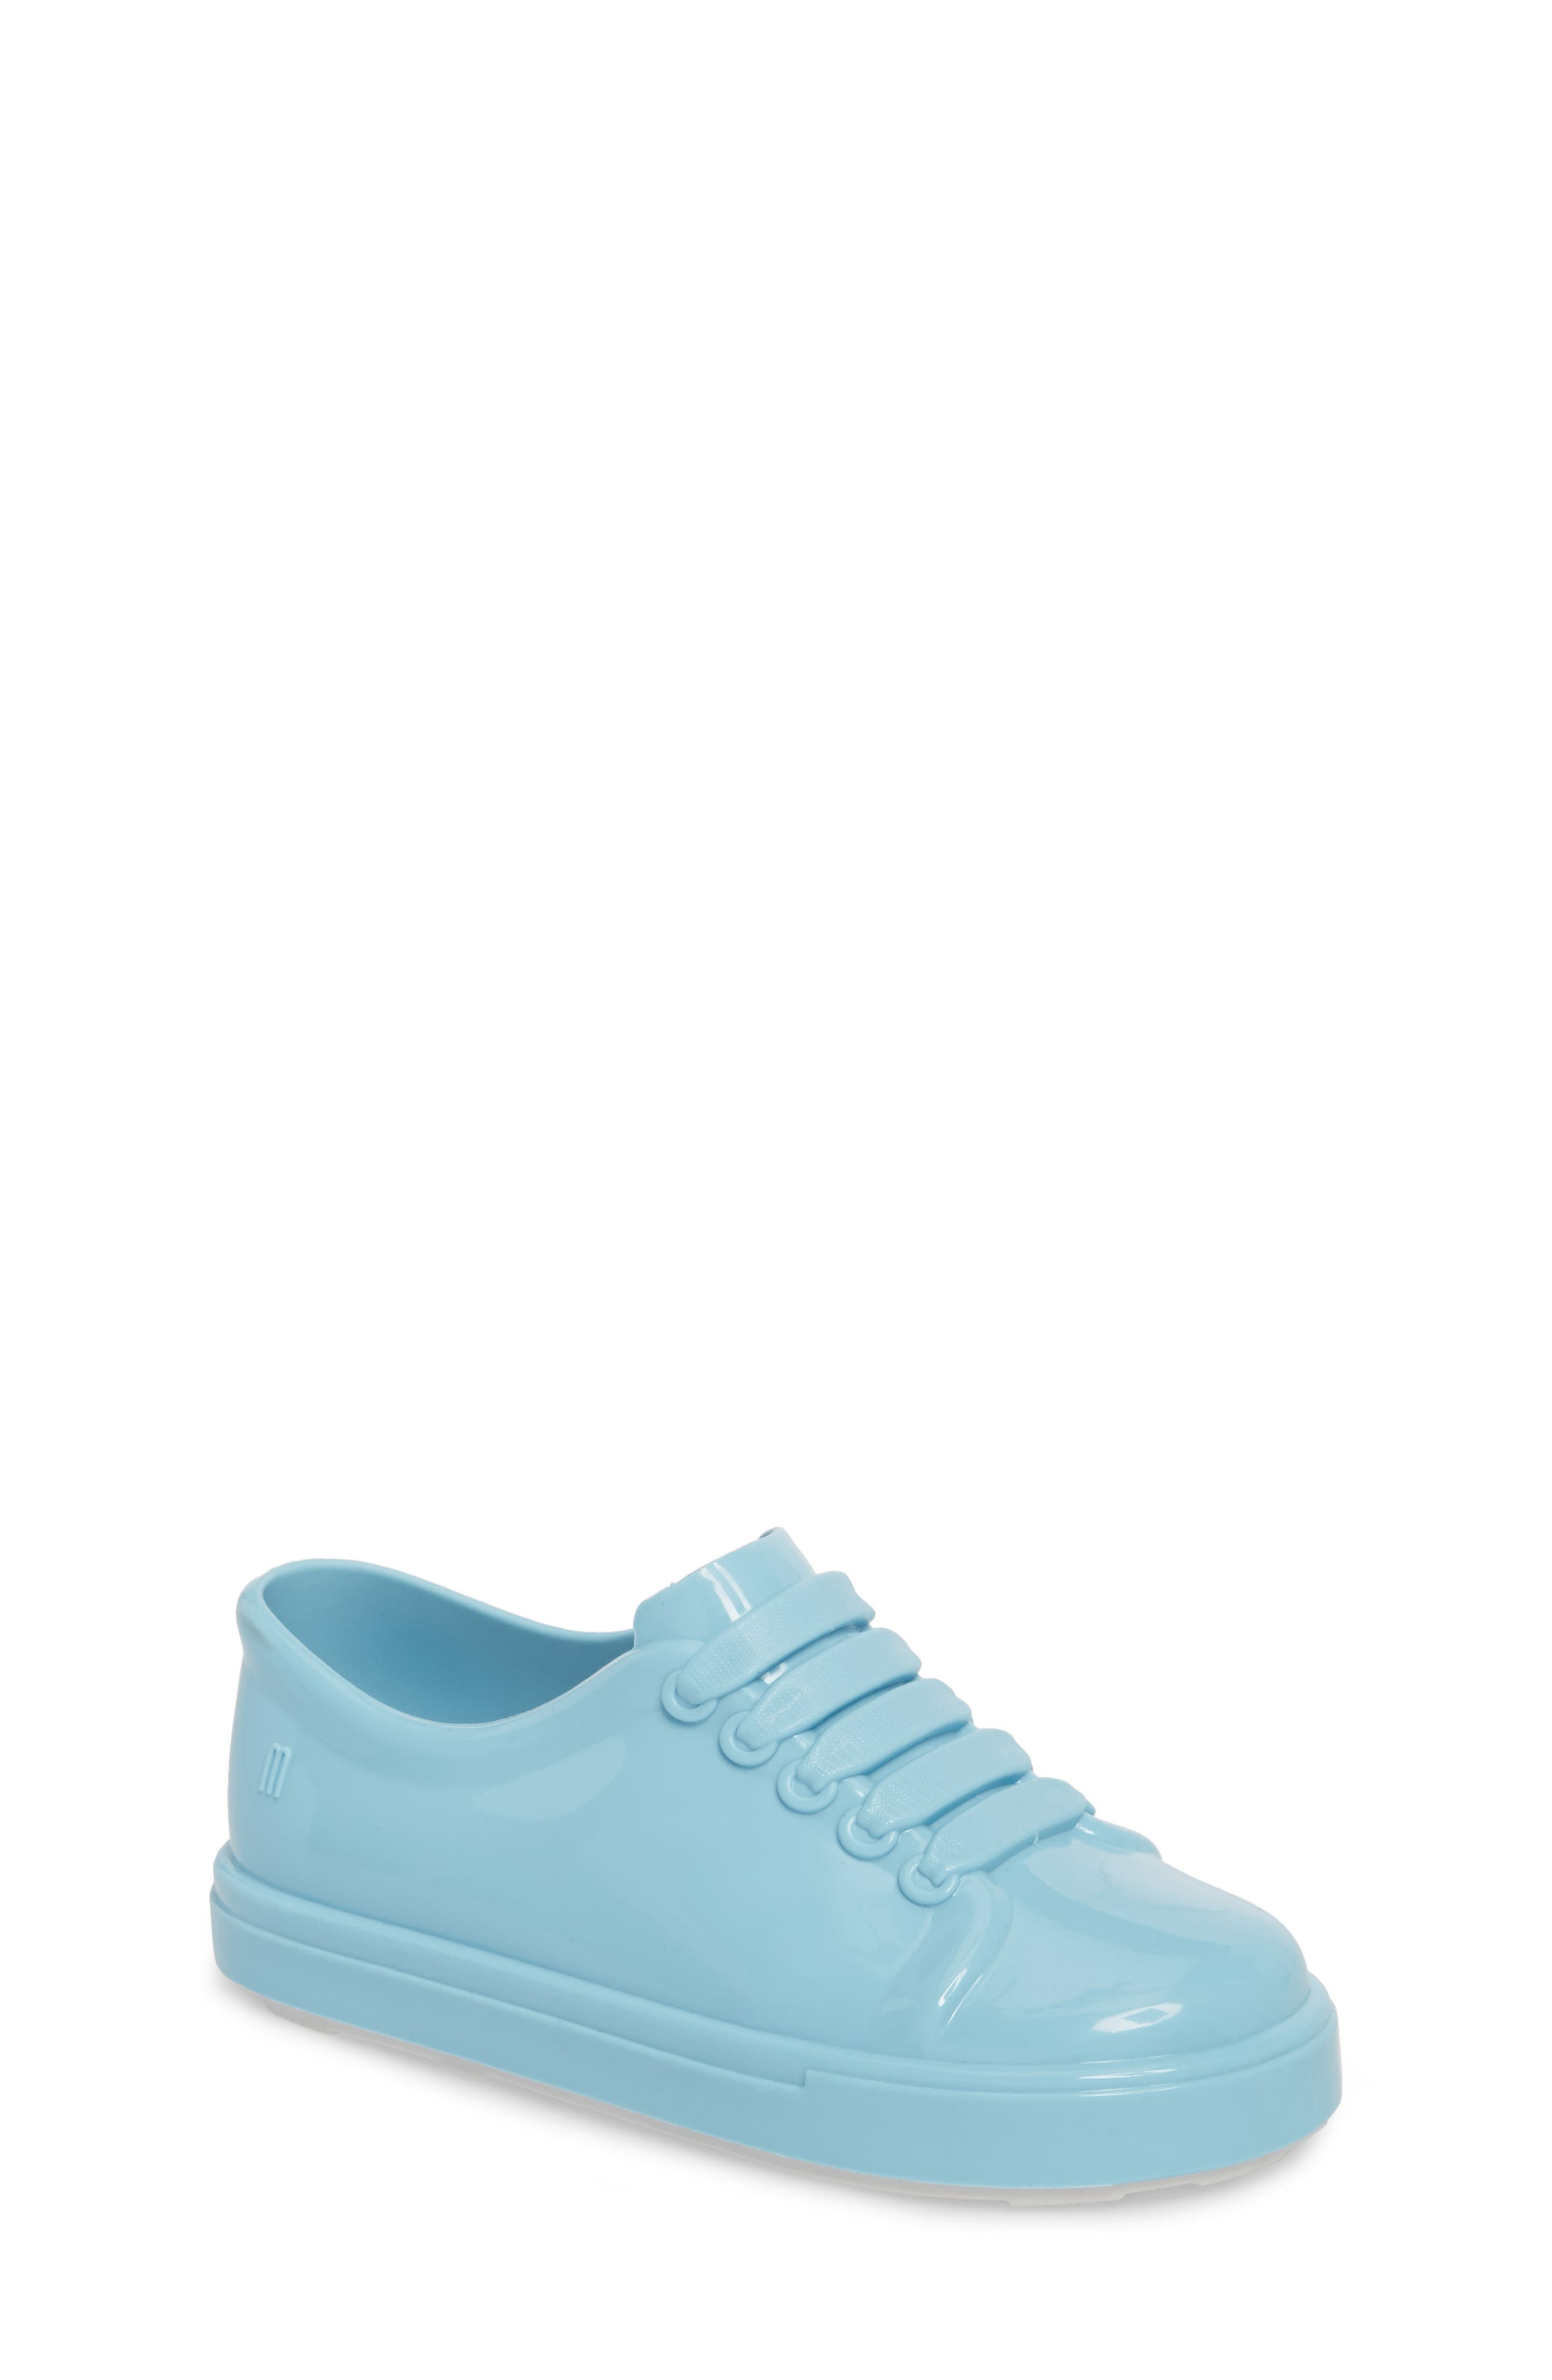 Be Slip-On Sneaker,                         Main,                         color, 433